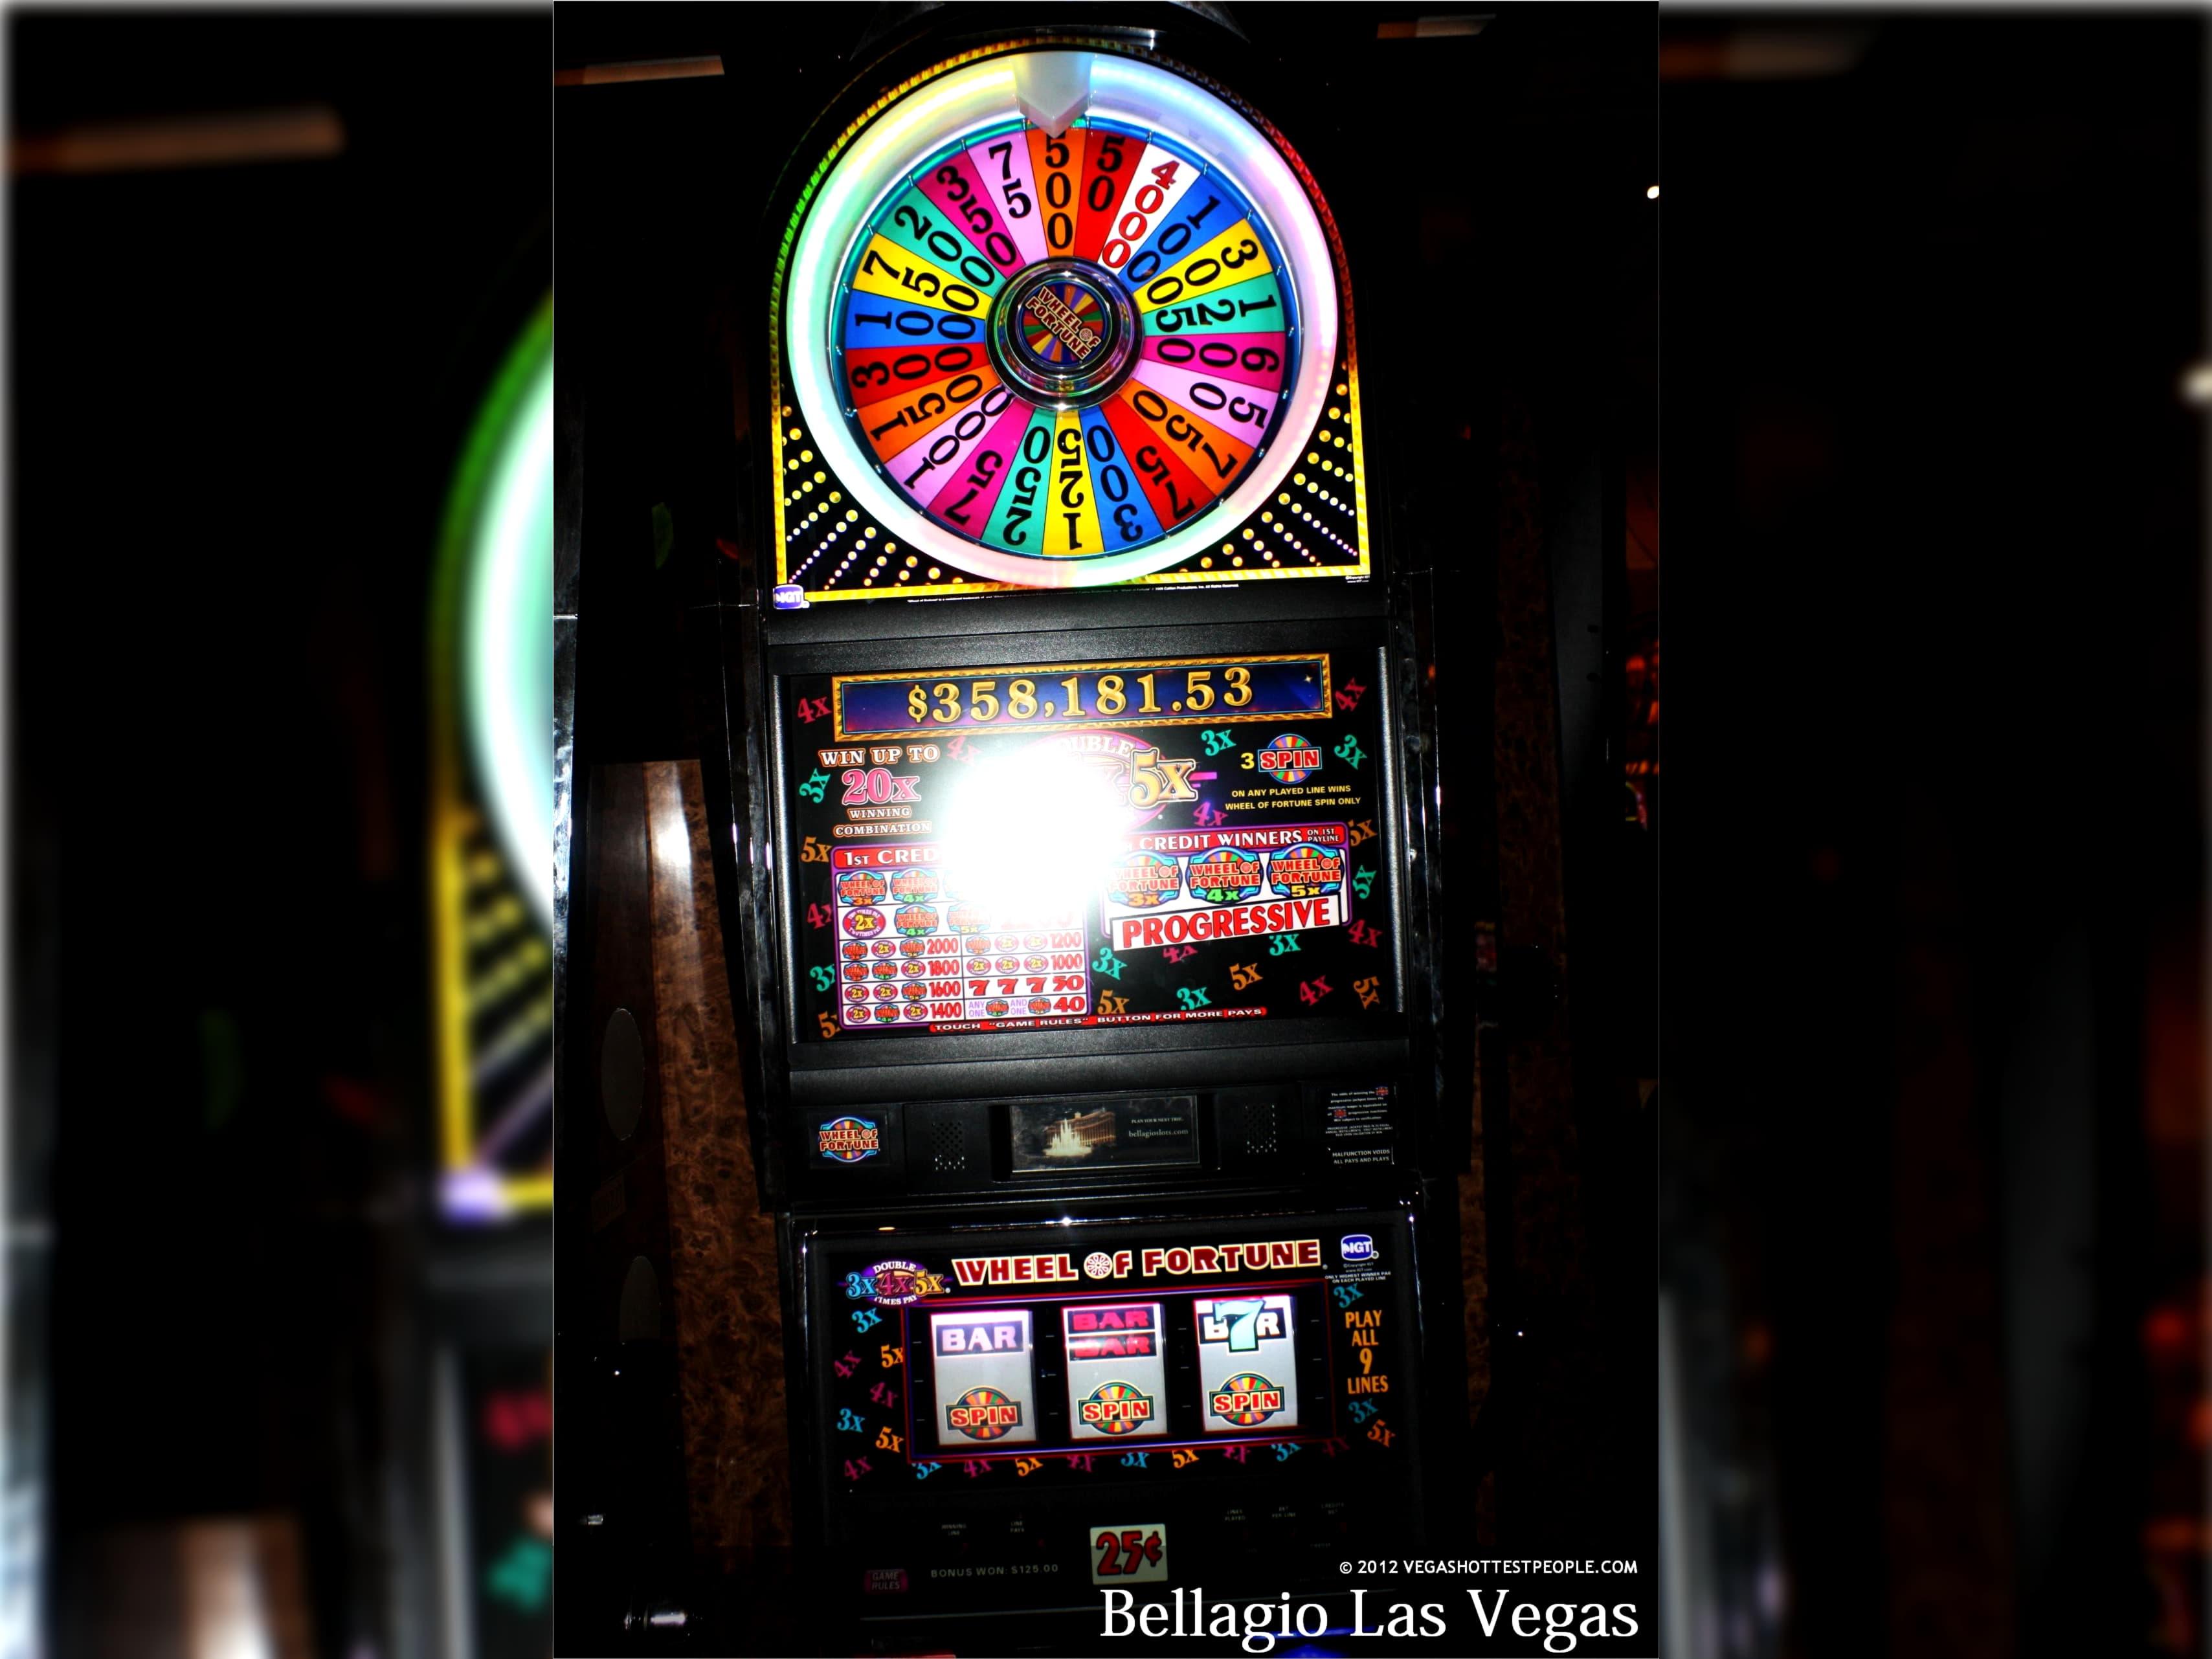 100 Free Spins no deposit casino at 777 Casino